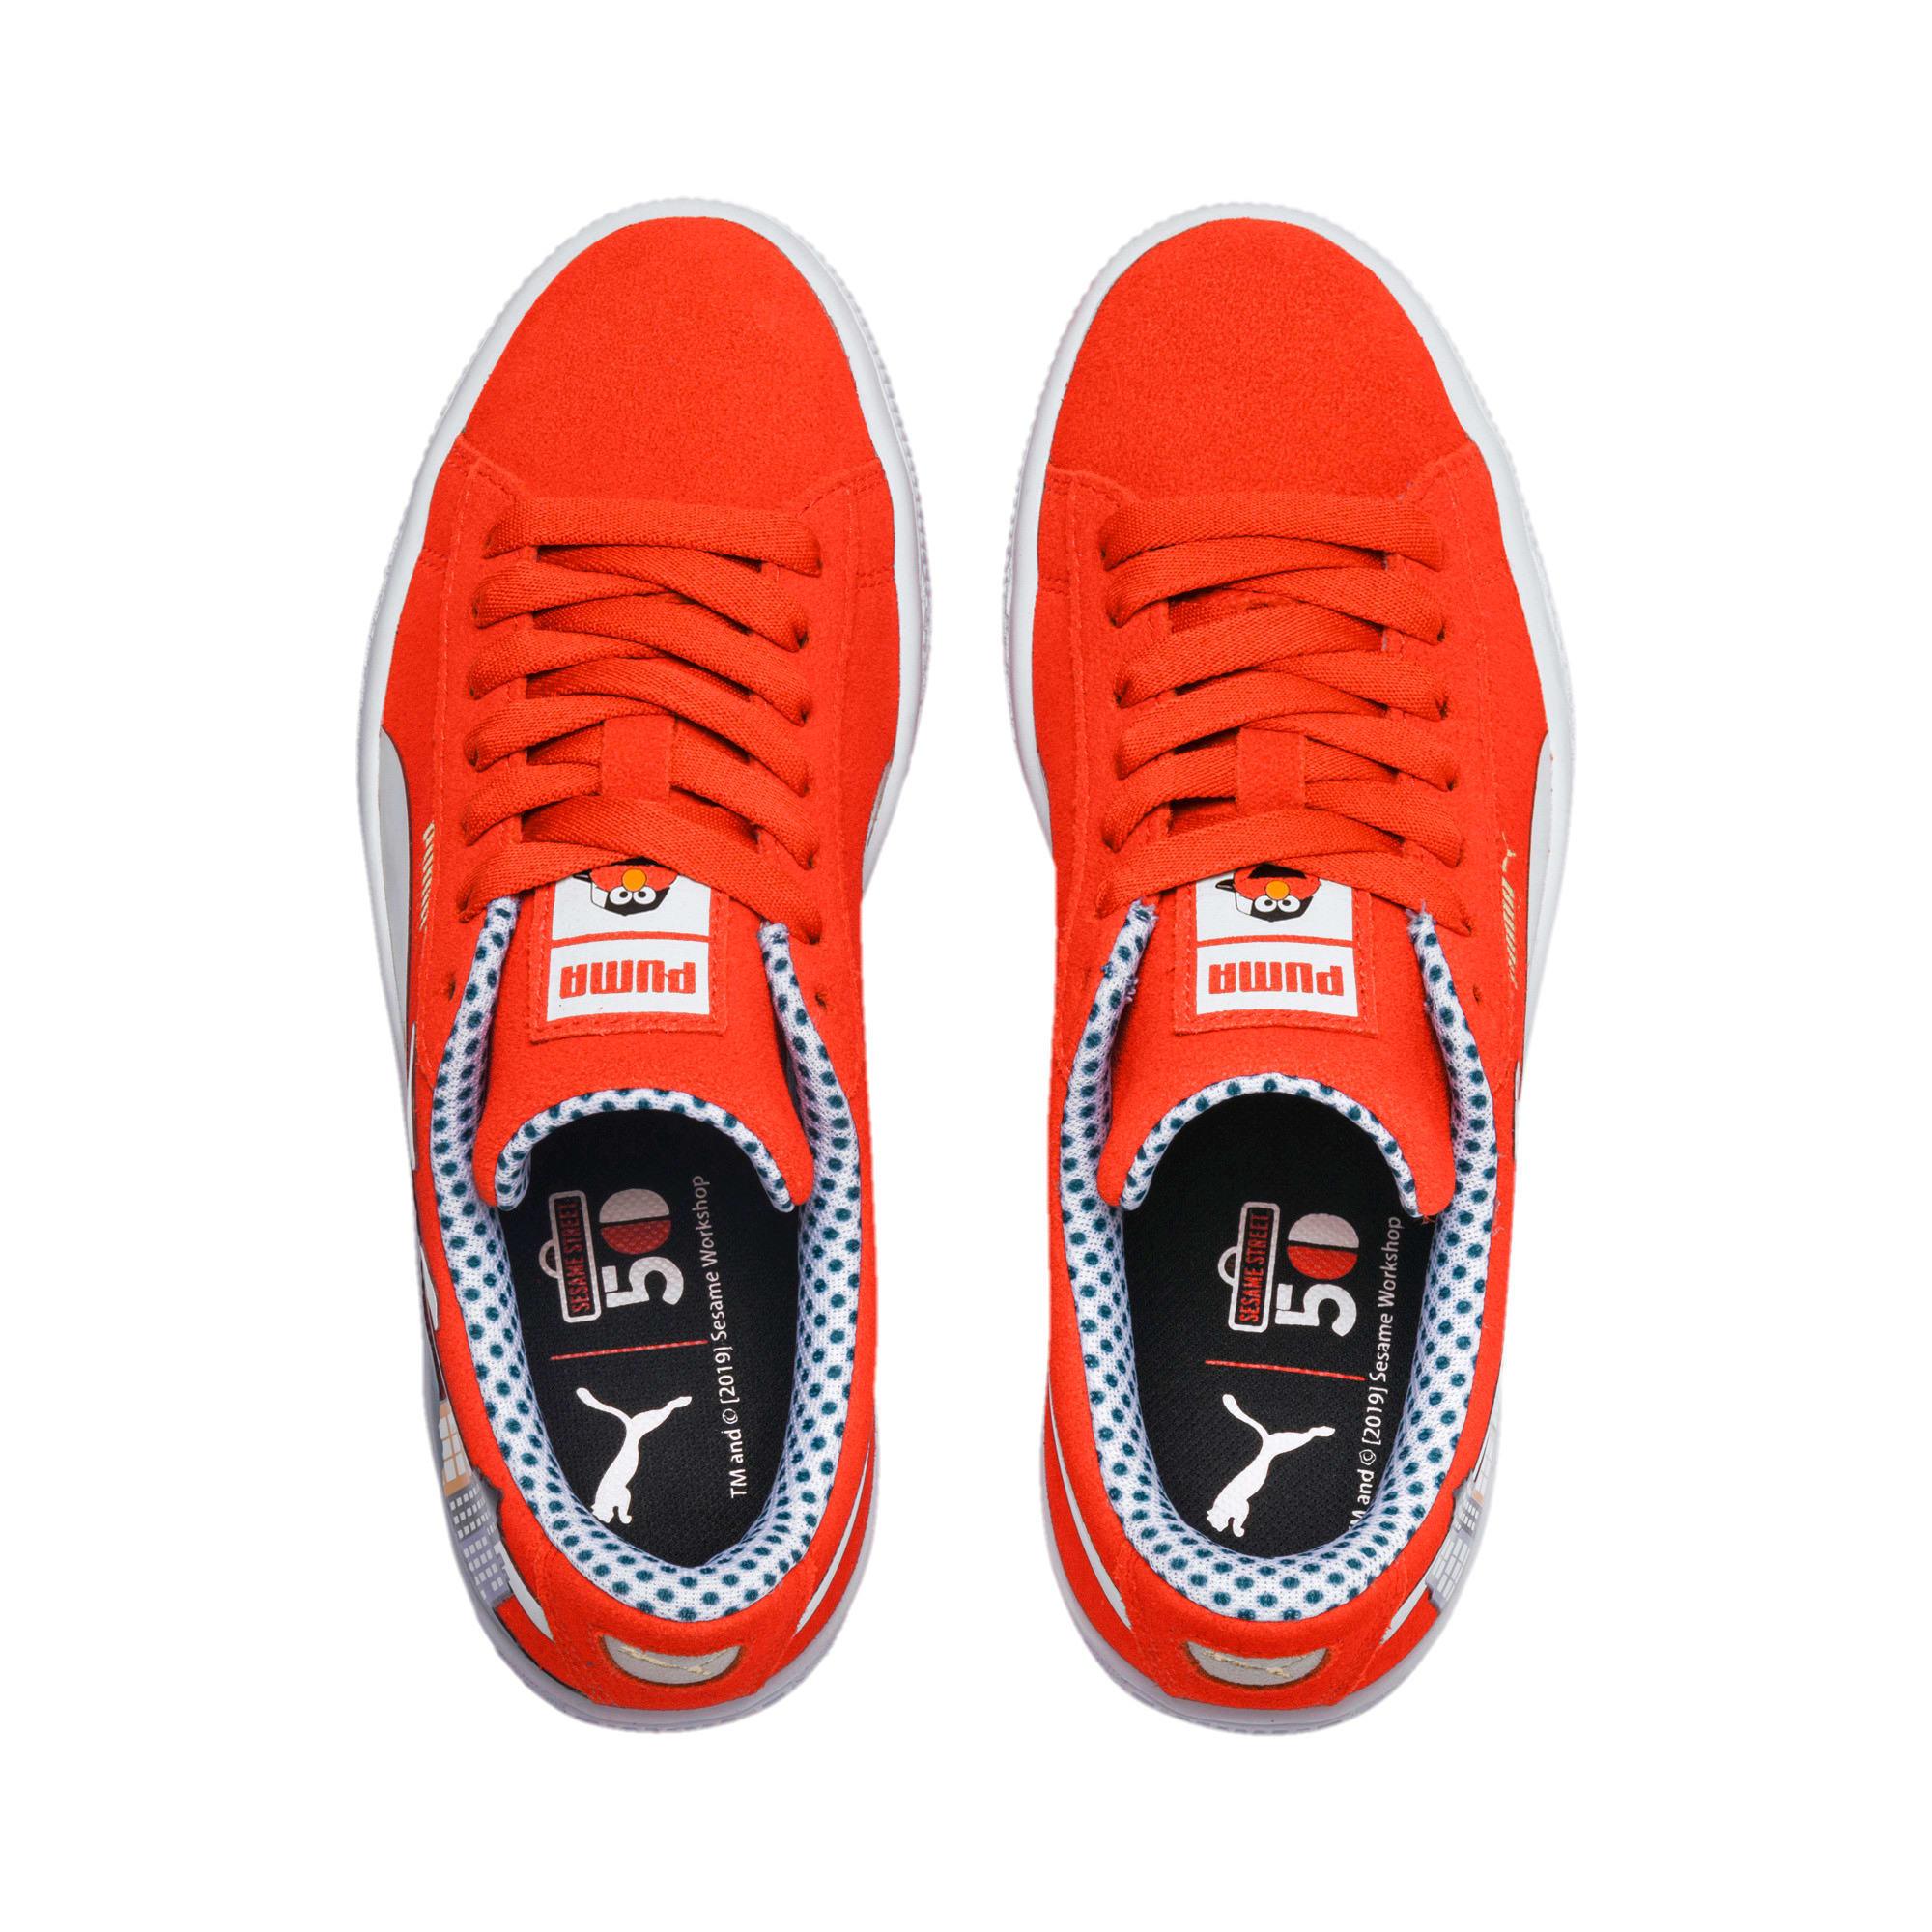 Thumbnail 6 of Sesame Street 50 Suede Little Kids' Shoes, Cherry Tomato-Puma White, medium